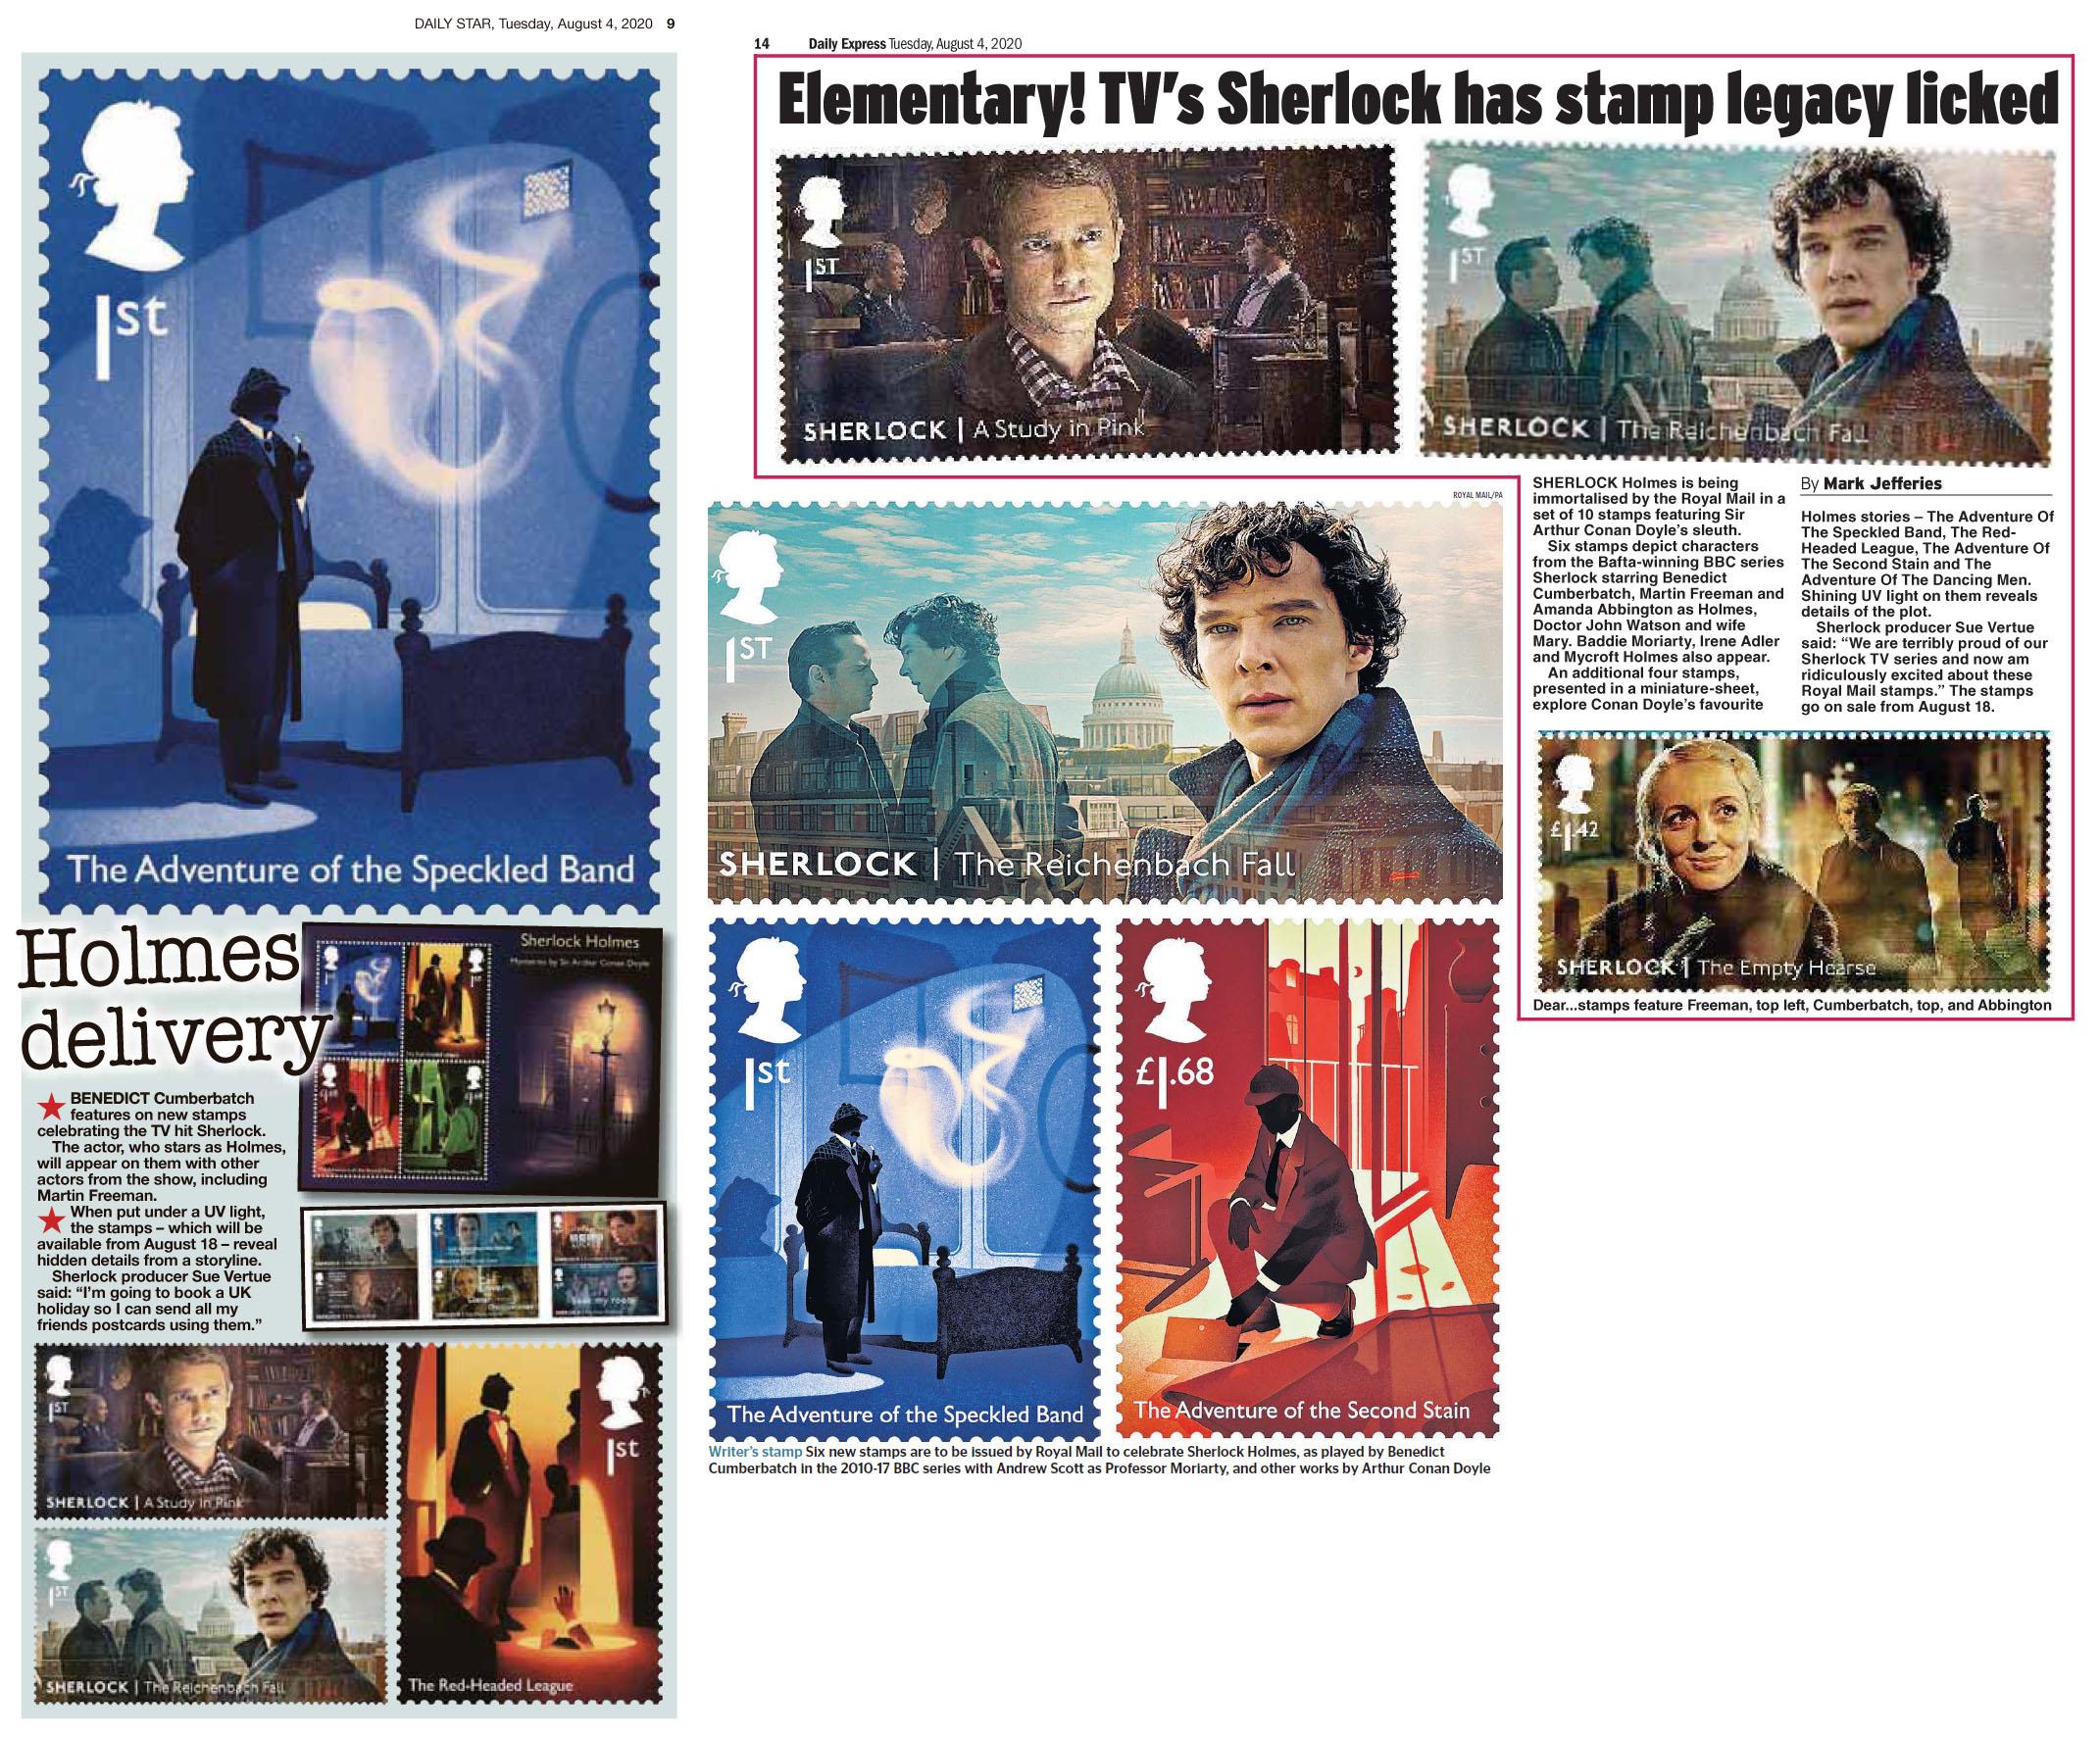 200804 British Press Sherlock Stamps.jpg